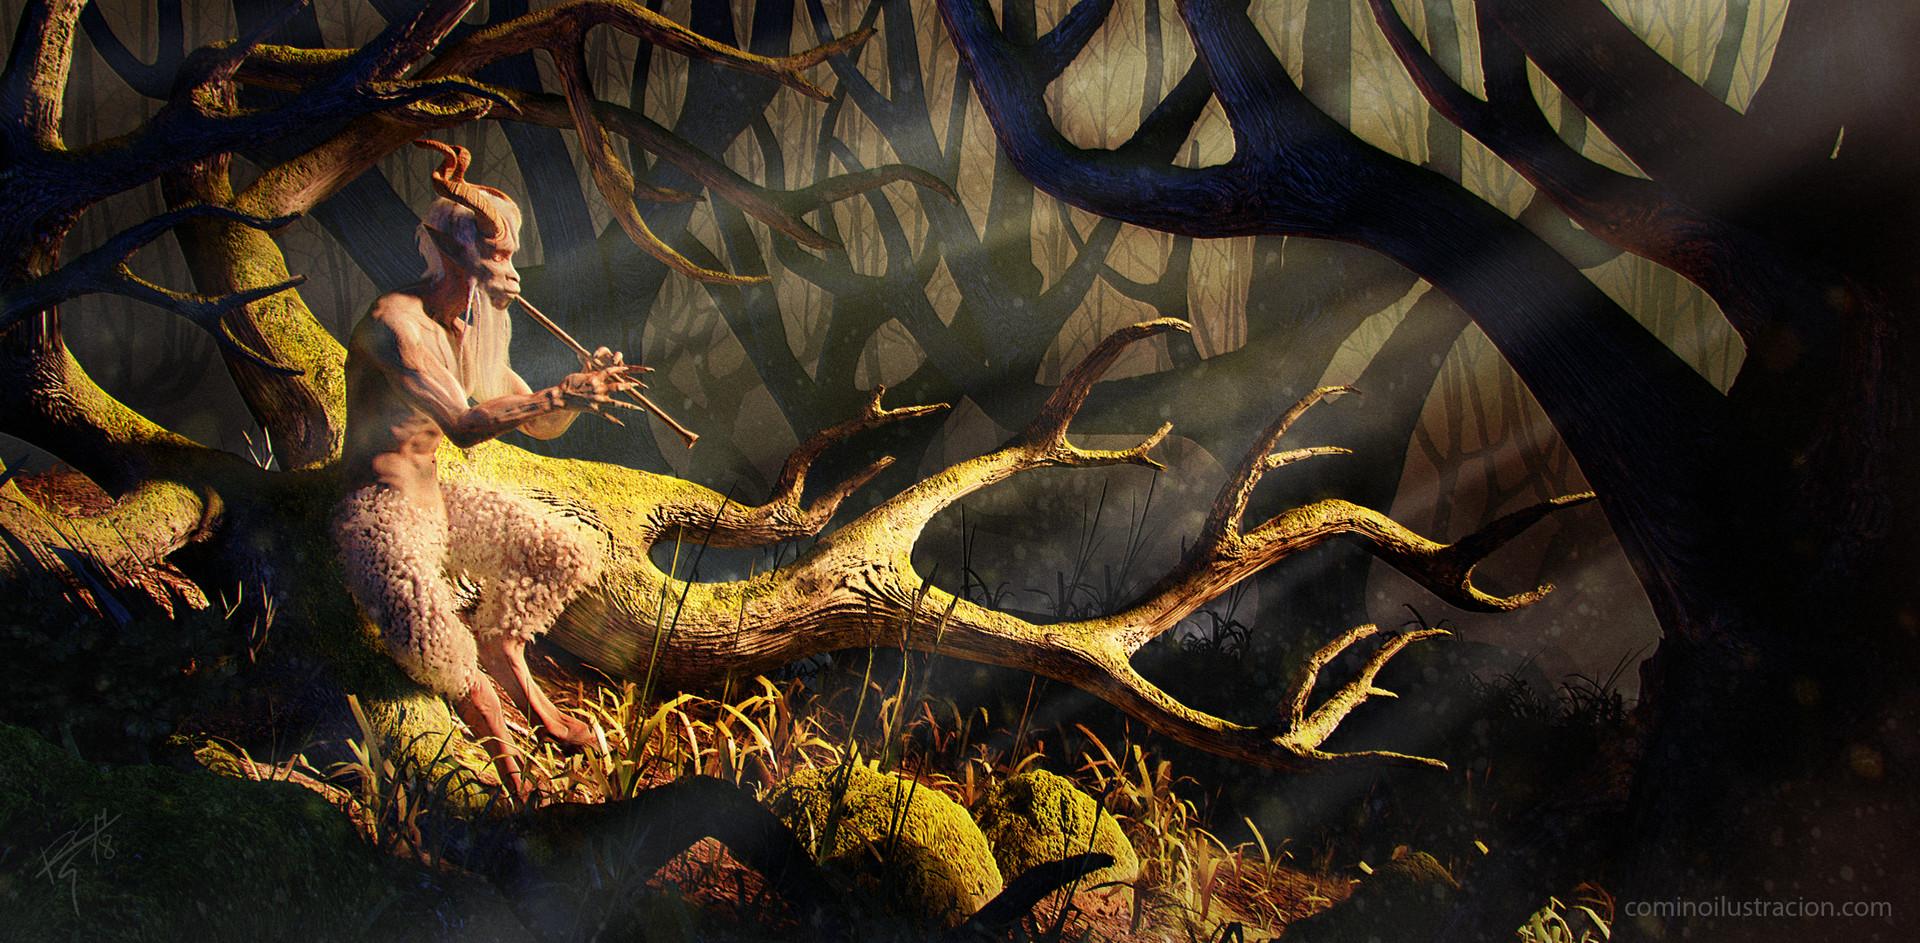 rafael-comino-matas-final-forest-creature-3